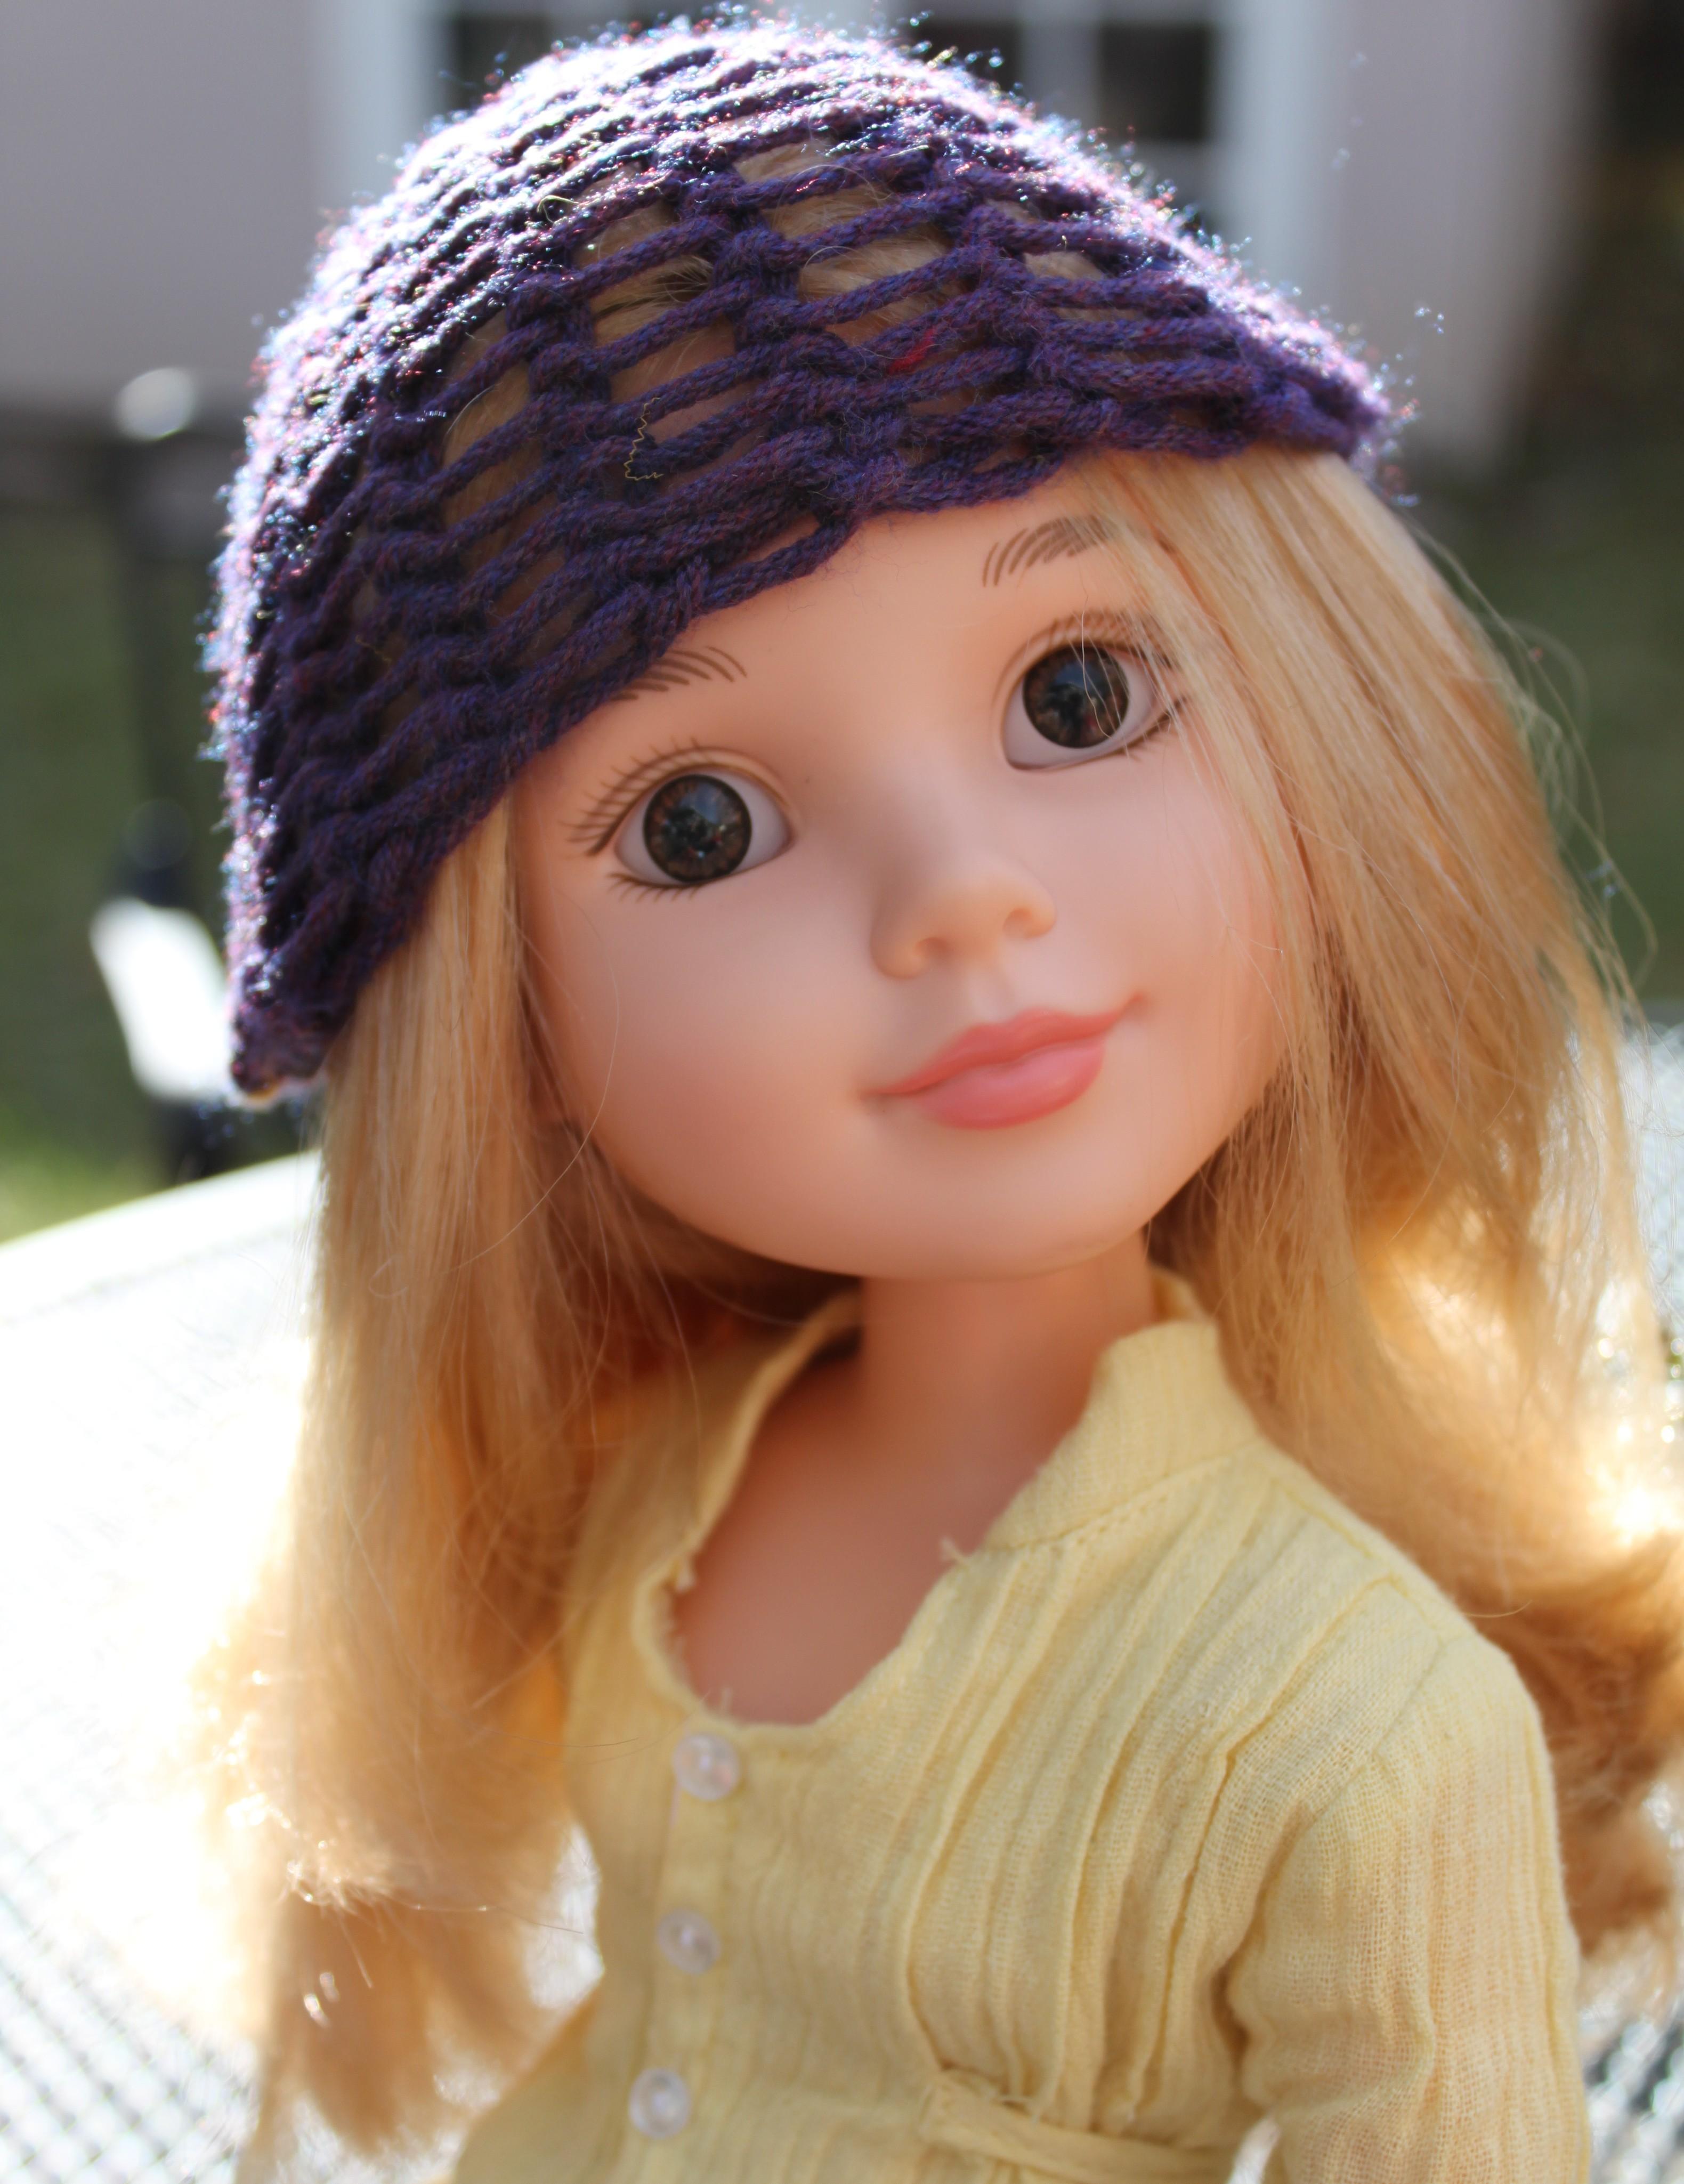 Knitting Nancy Doll : Img my material life